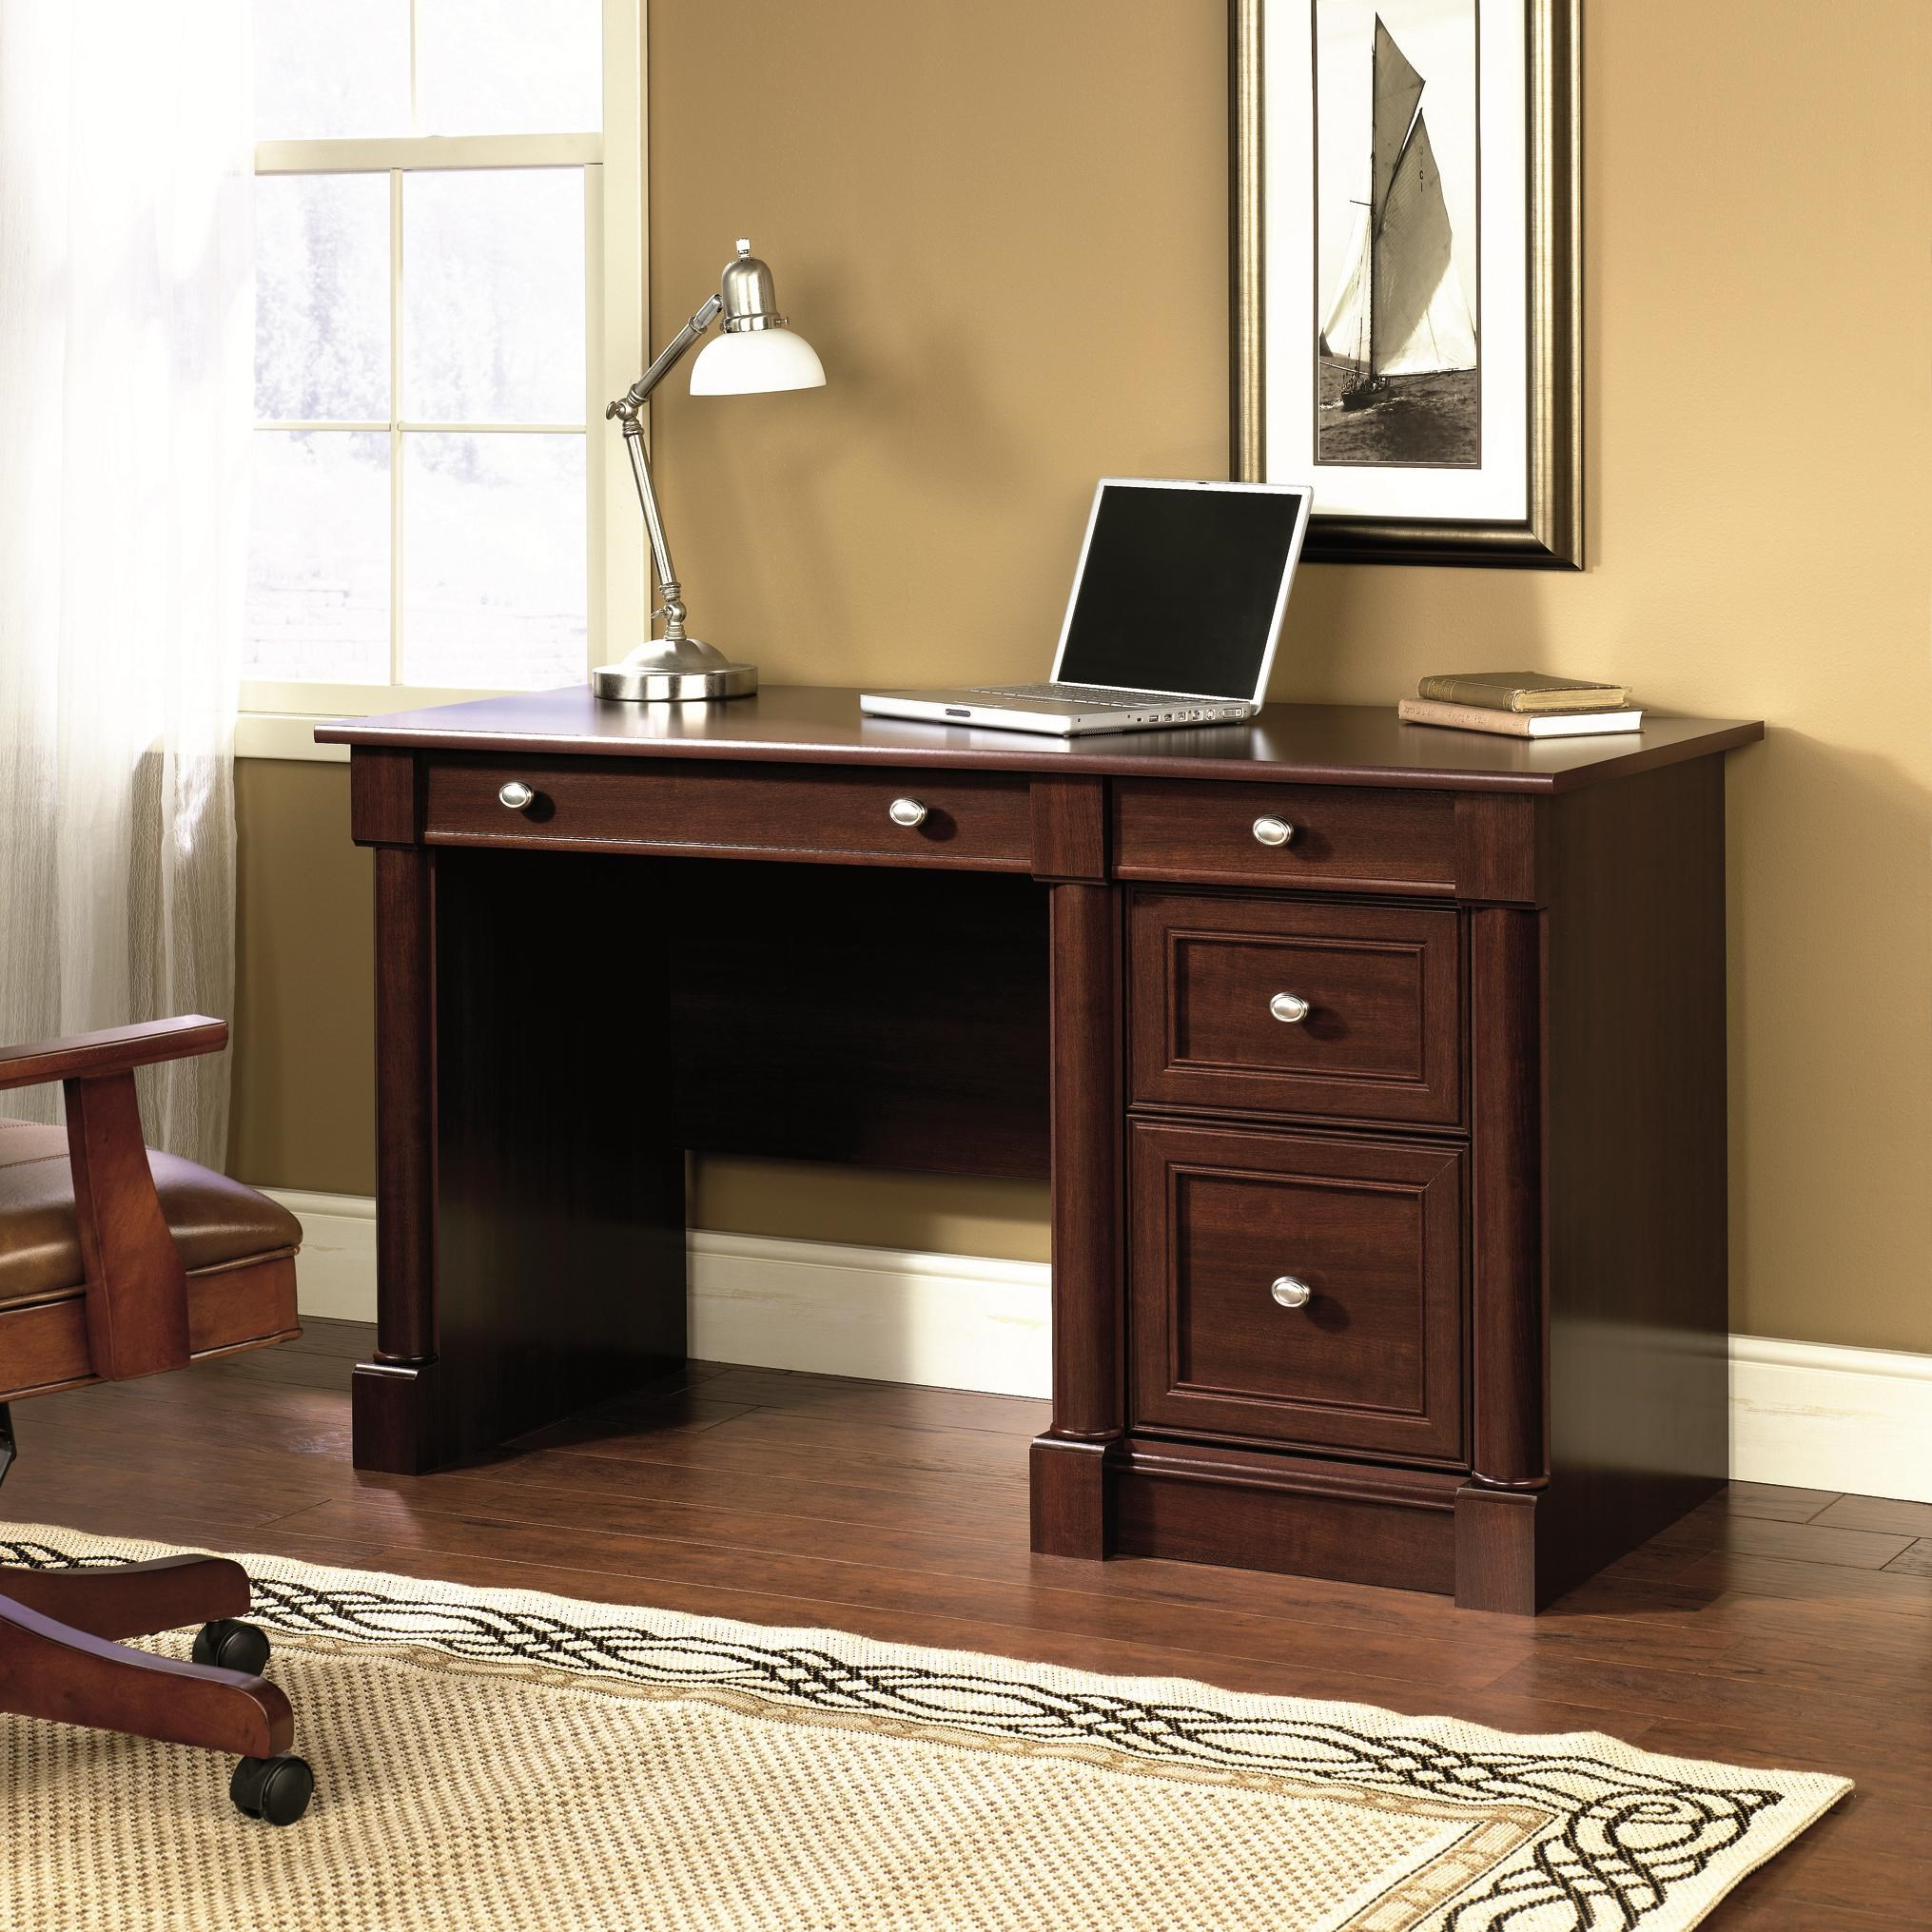 Sauder PalladiaComputer Desk; Sauder PalladiaComputer Desk